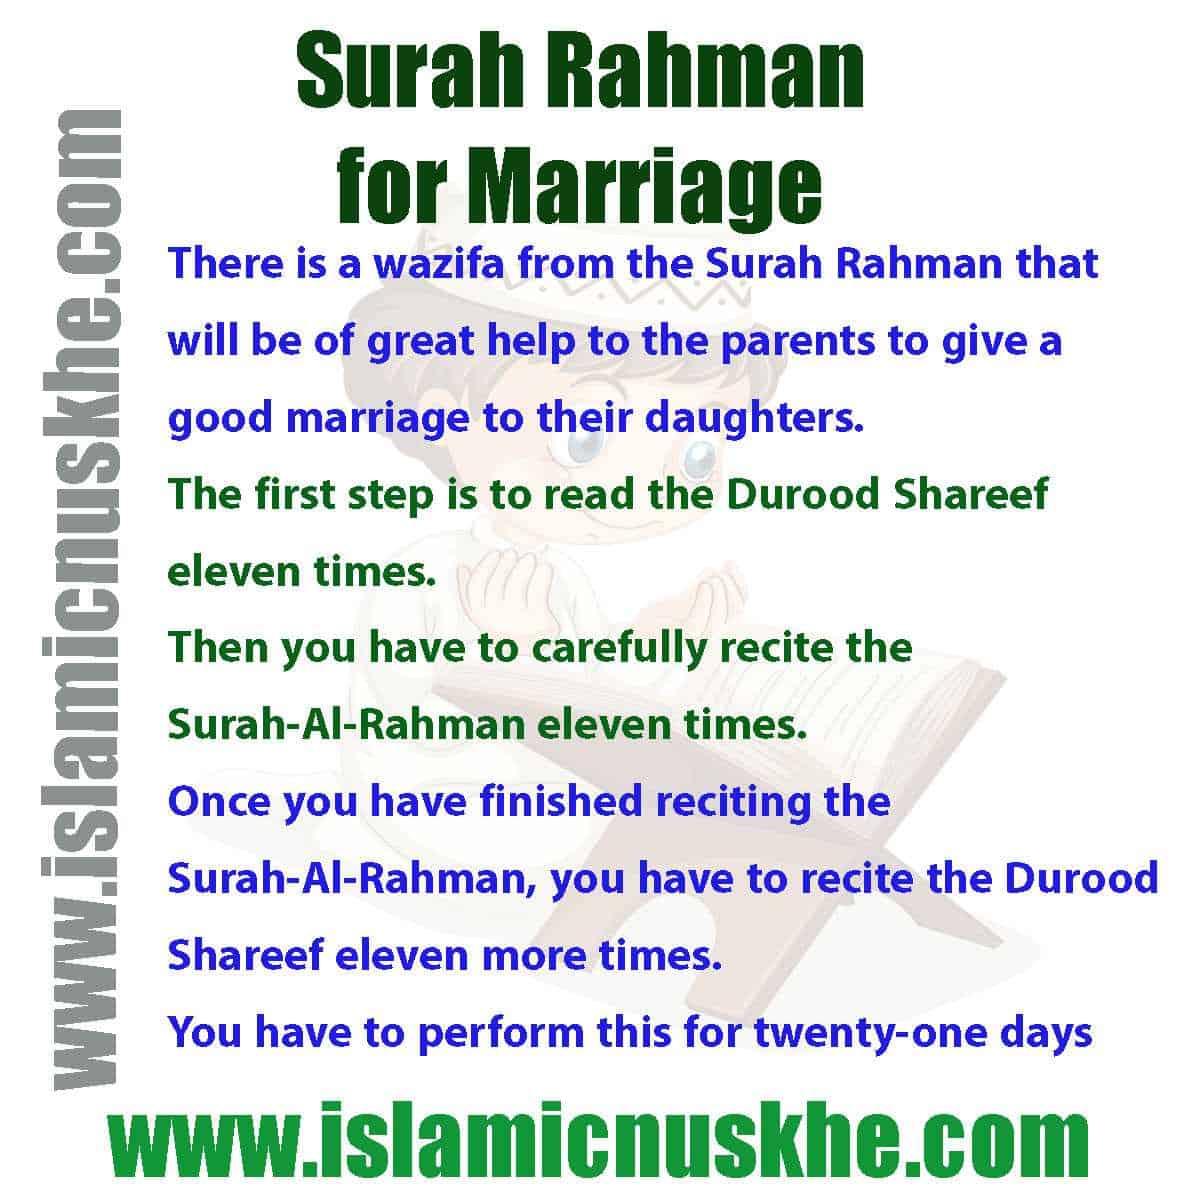 Here is surah rahman for marraige